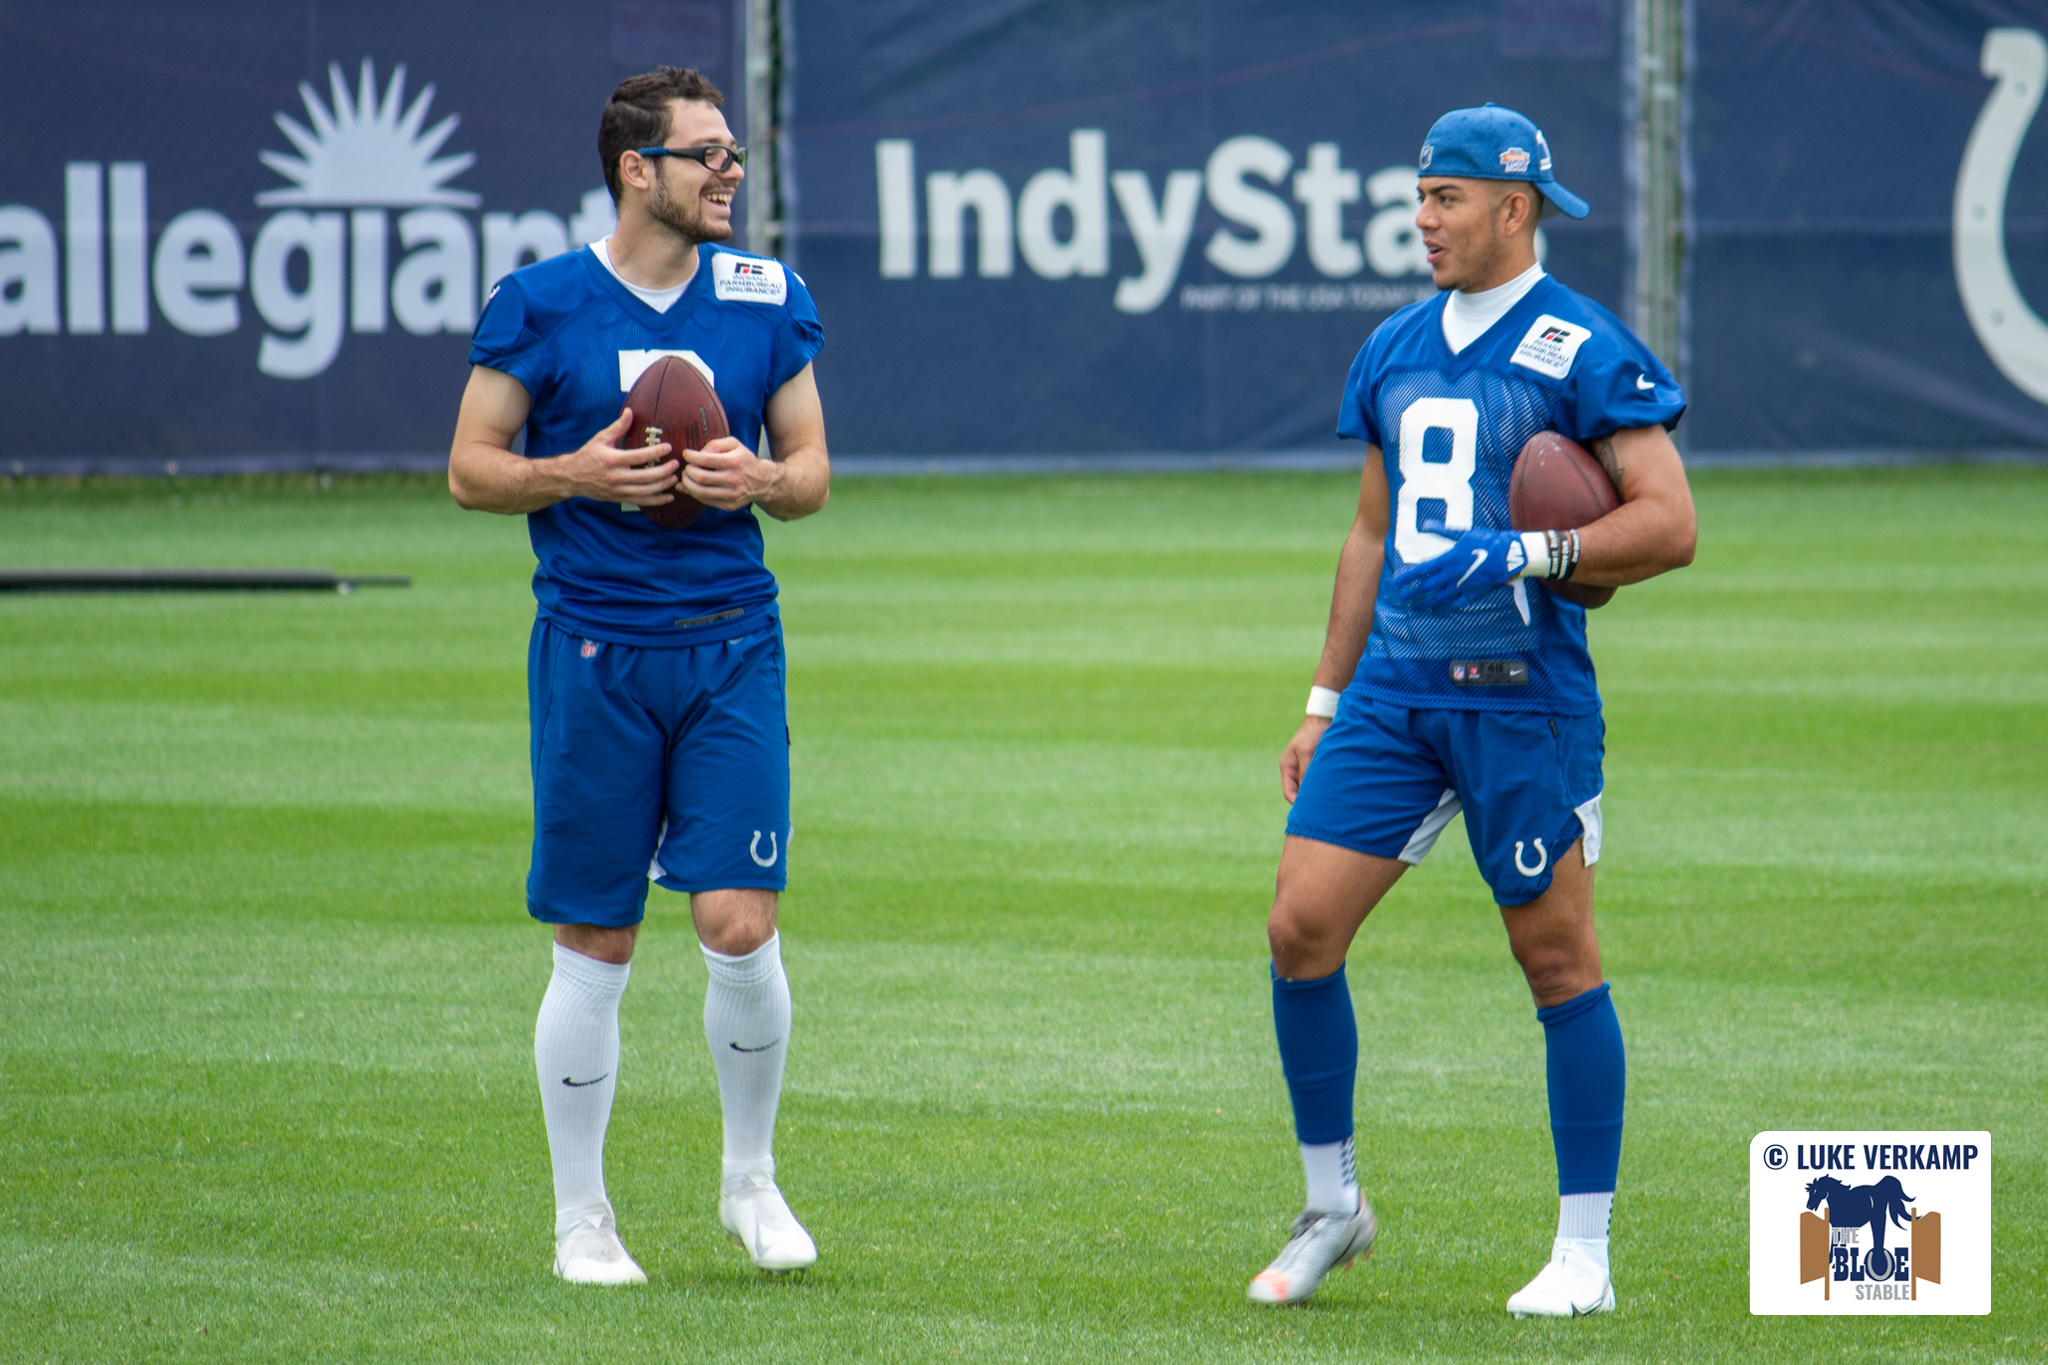 Colts v Ravens Post Game